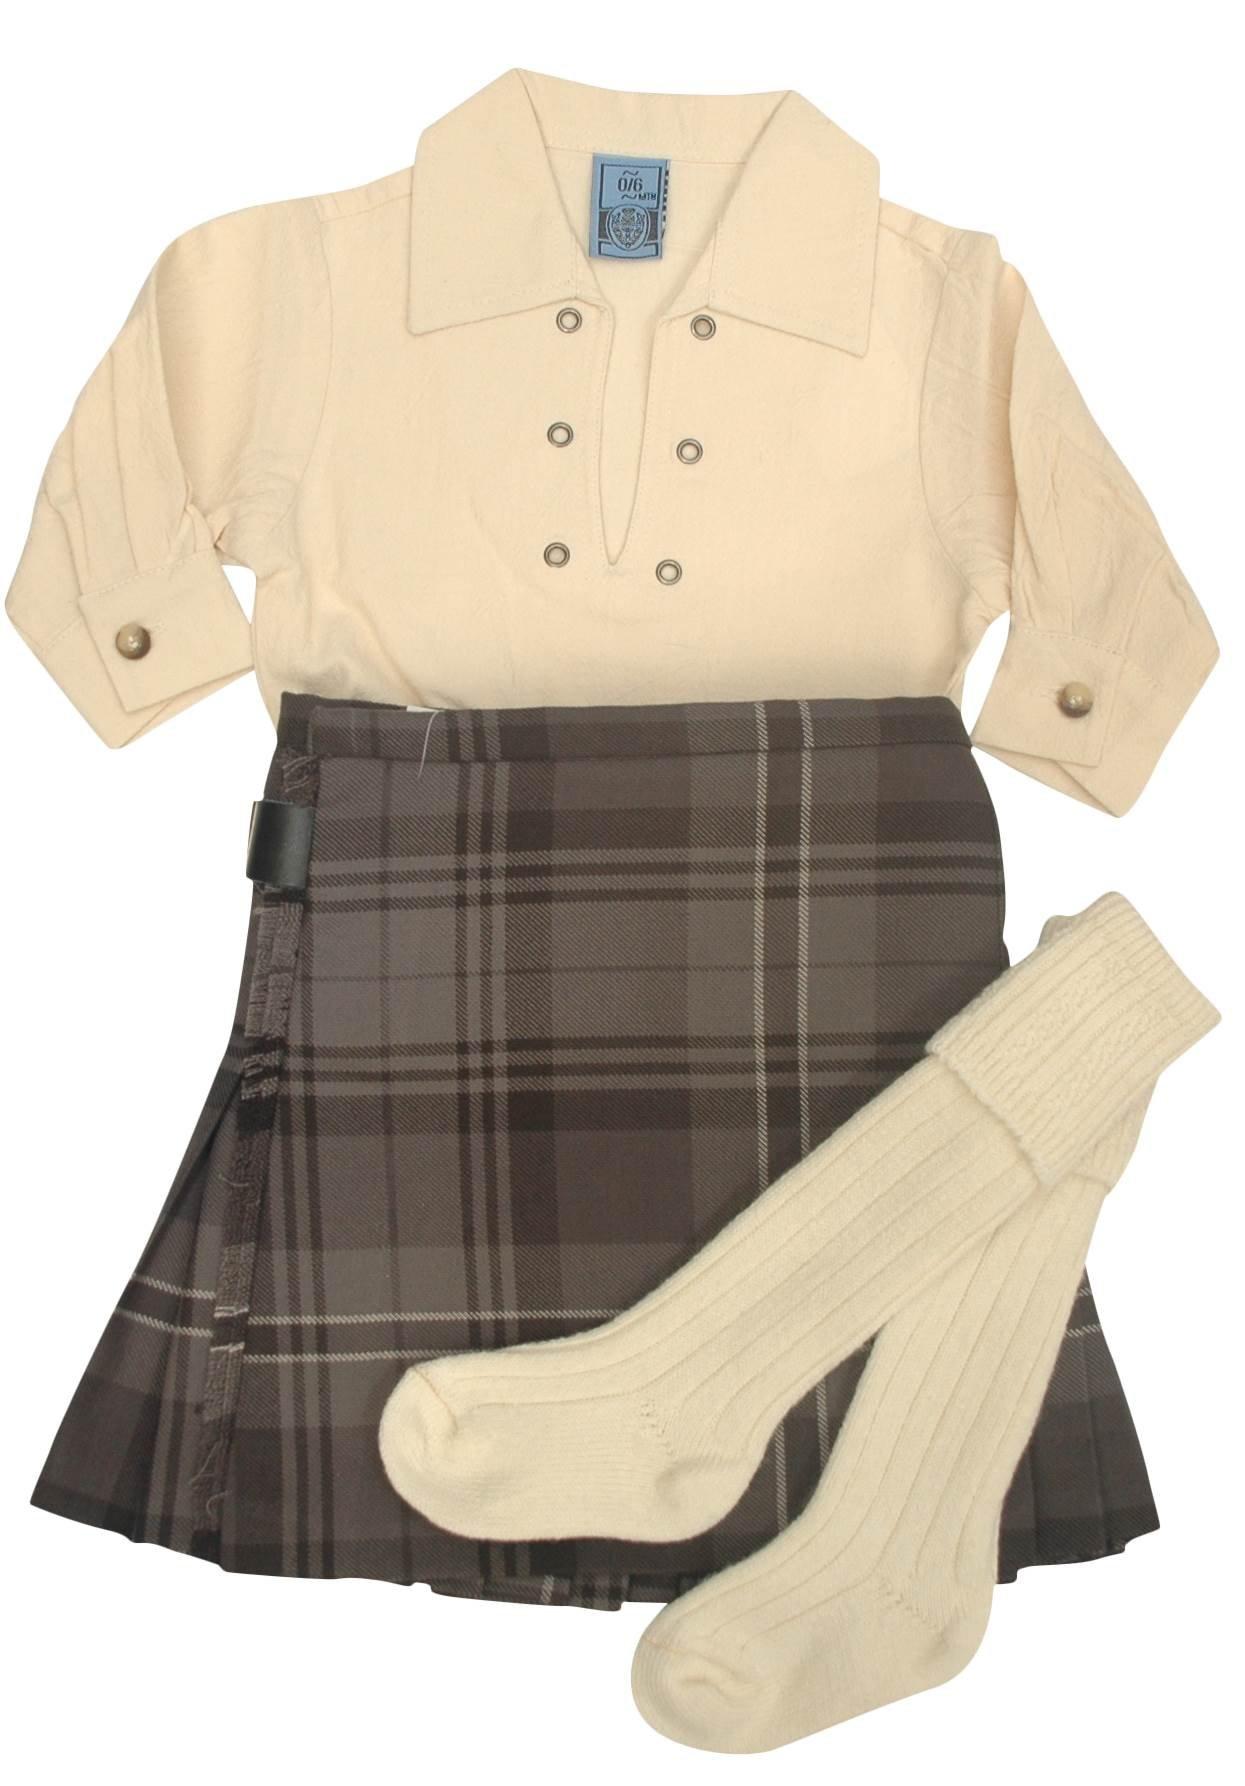 Boys Hamilton Grey Tartan Kilt Outfit Set with Hose and Shirt (0-12 Months)